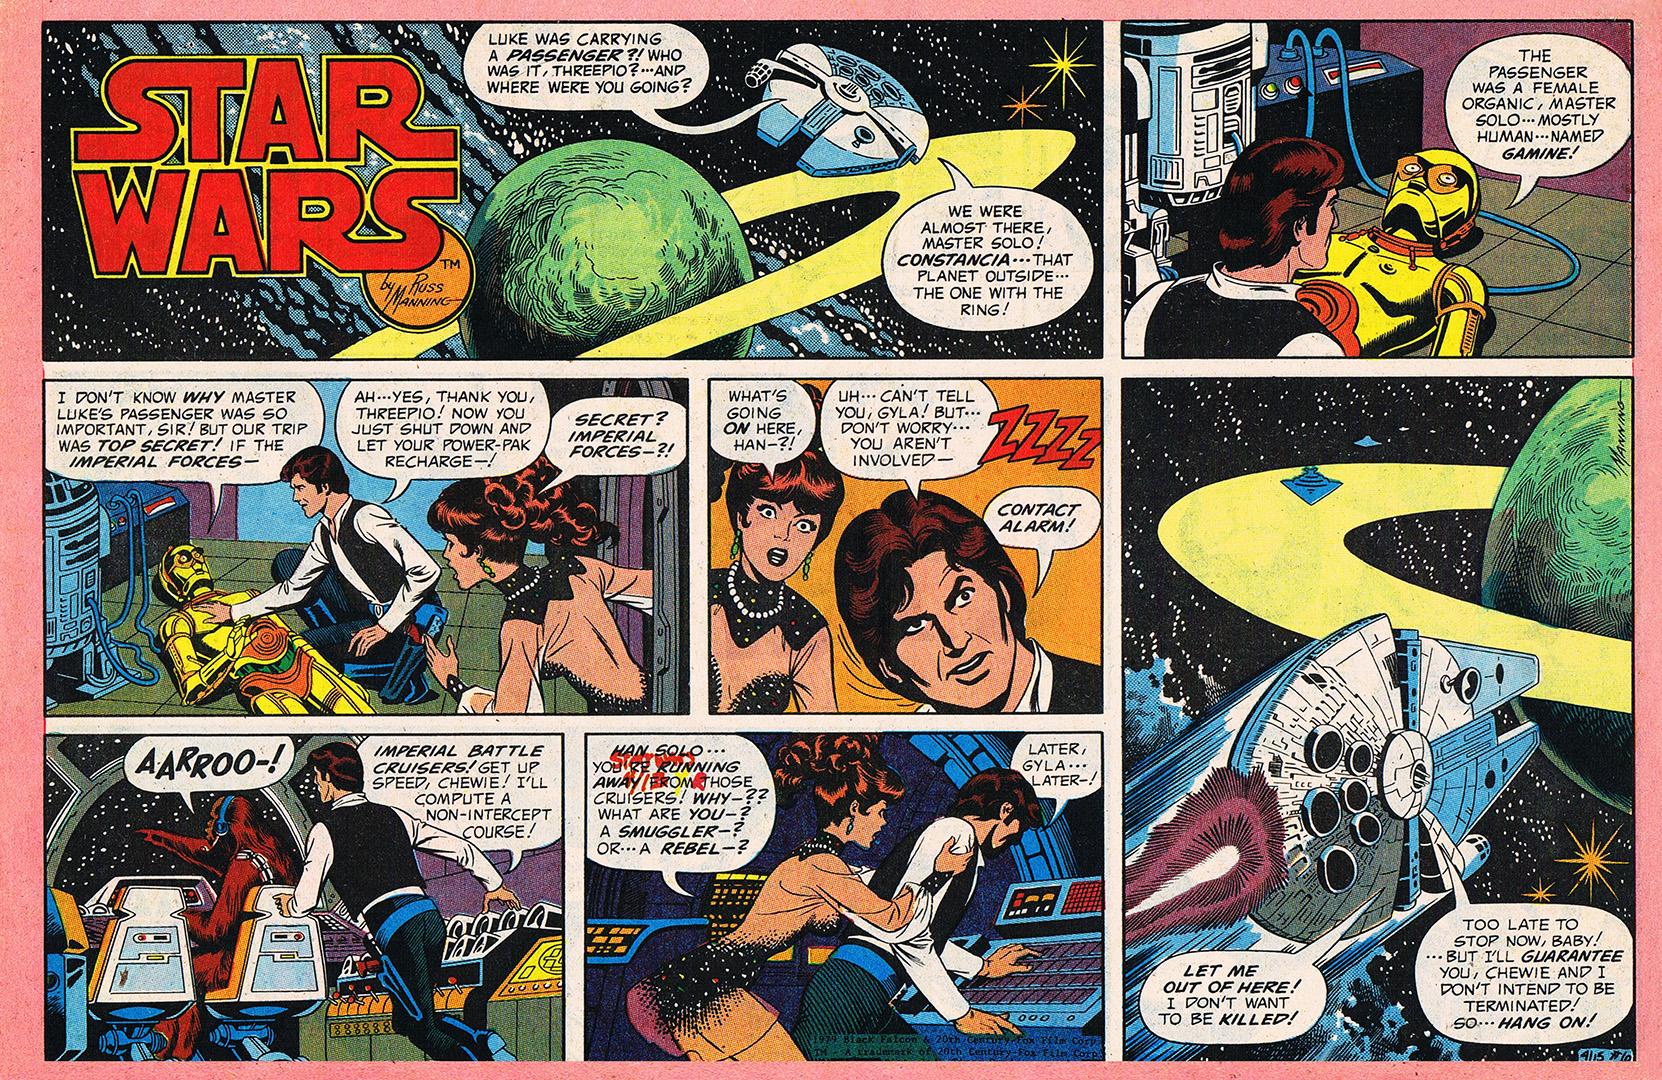 And hanis comic strip